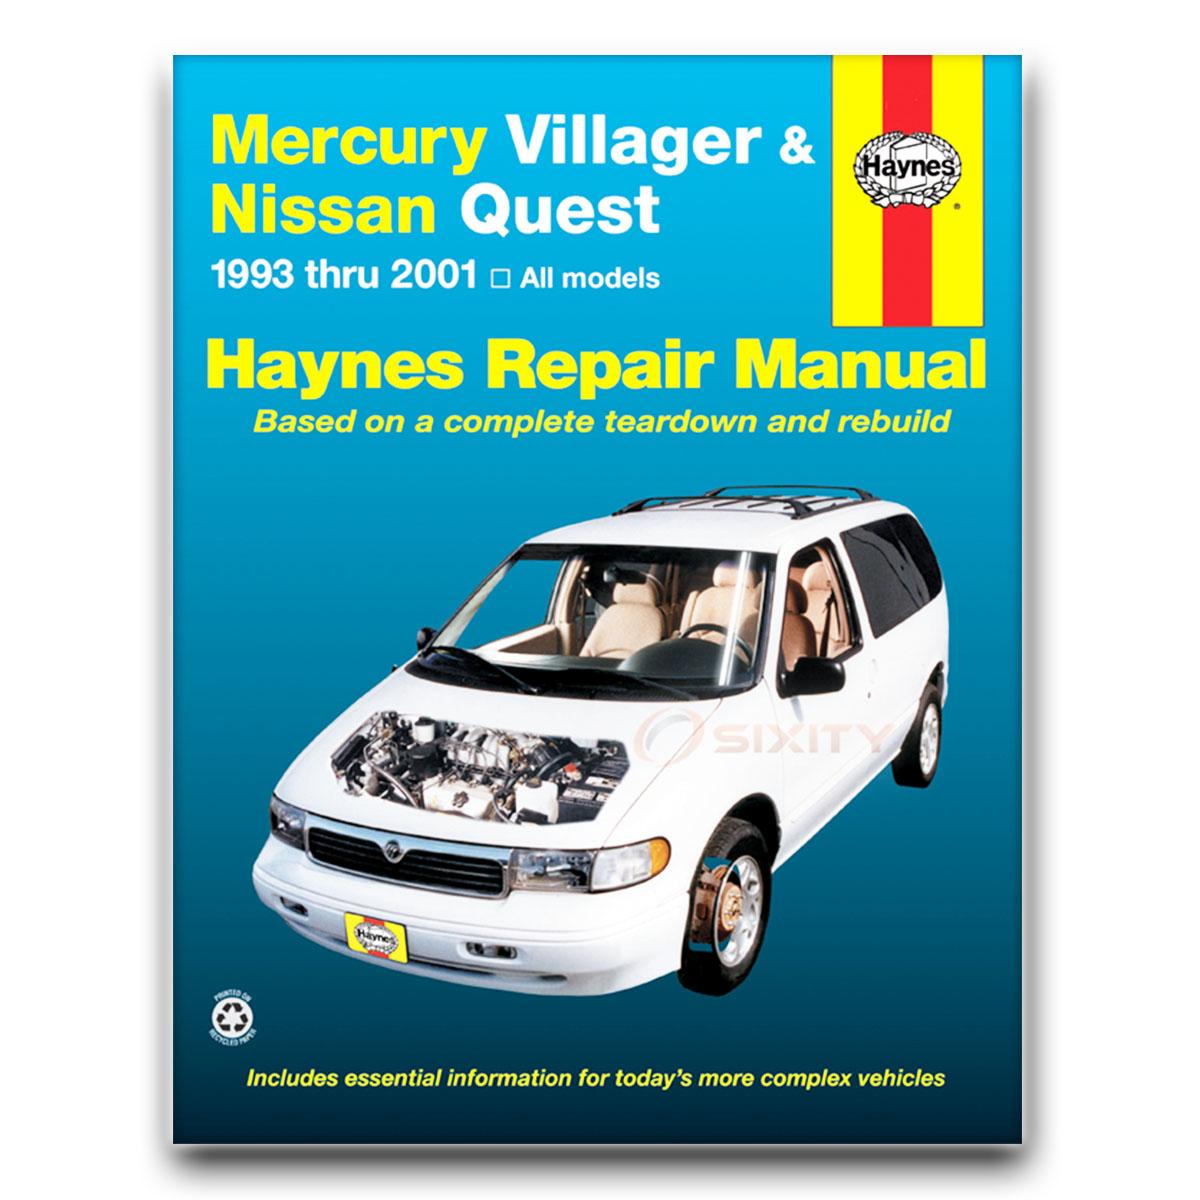 haynes repair manual for nissan quest gle xe se gxe shop service rh ebay  com Chilton Auto Repair Manual Chilton Auto Repair Manual